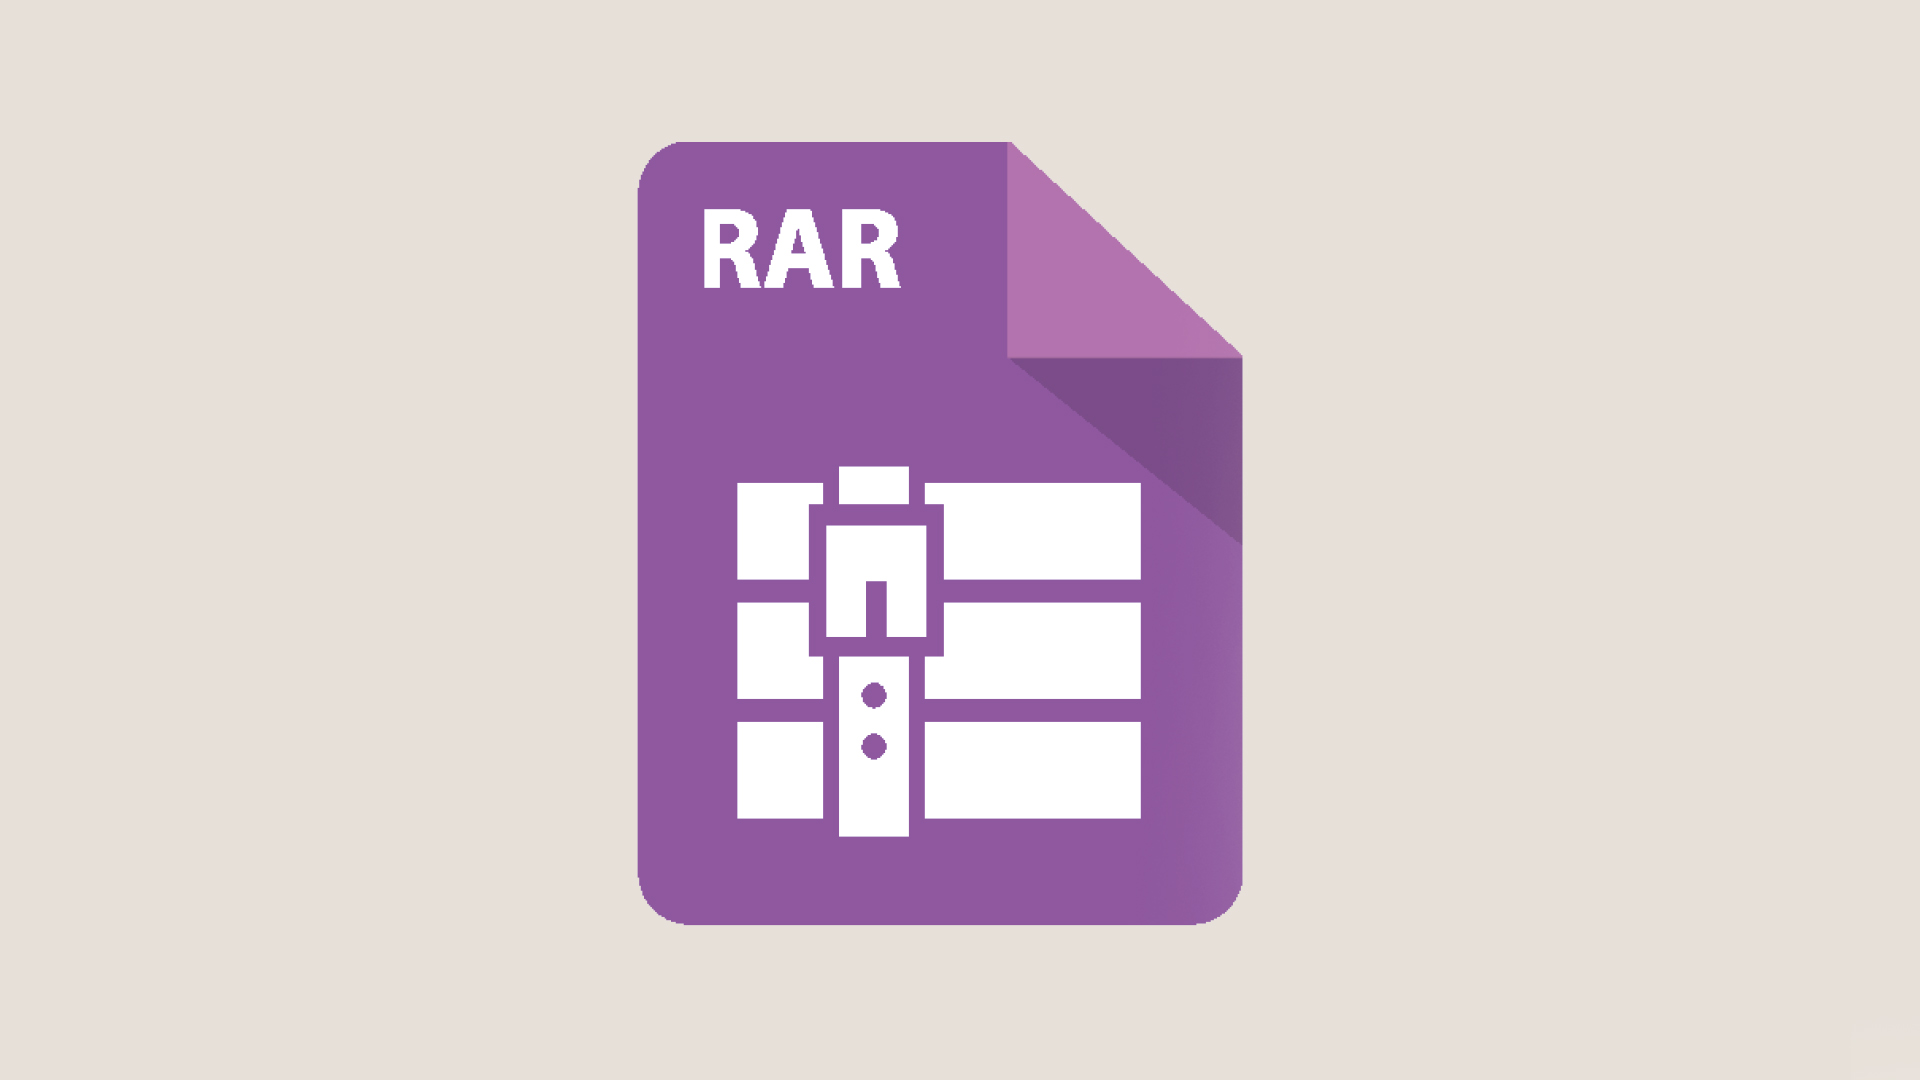 RAR-Dateien öffnen in Windows, Mac OS X, iPhone &Android – so geht's